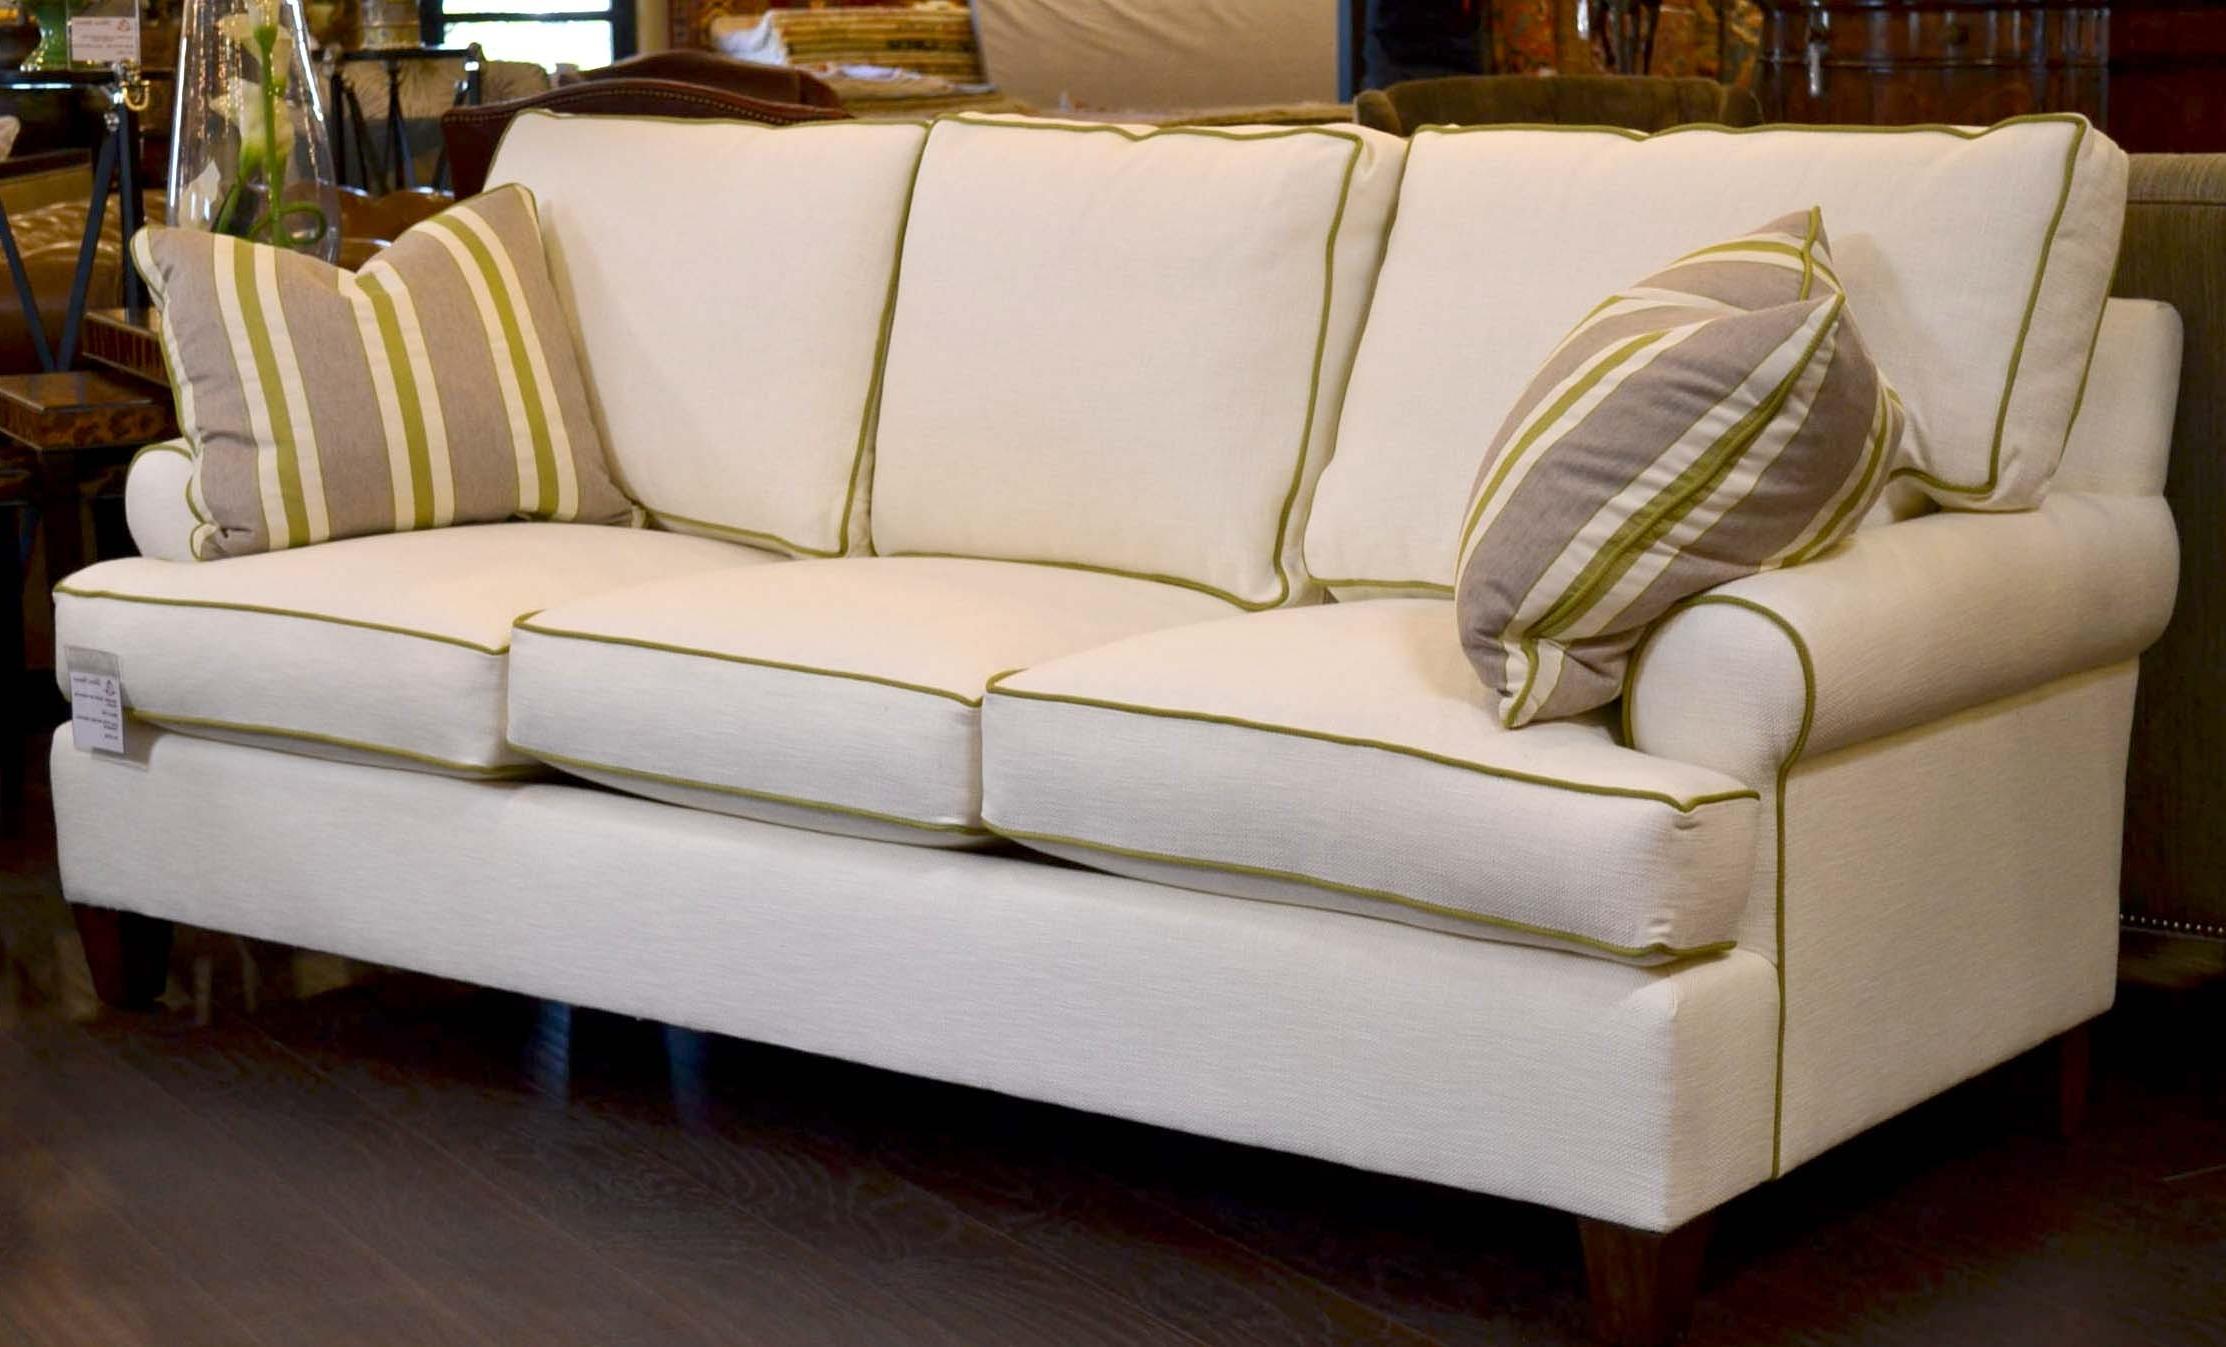 Preferred Orange County Sofas With Regard To Cool Henredon Sofa About Luxury Furniture Store In San Go Orange (View 19 of 20)